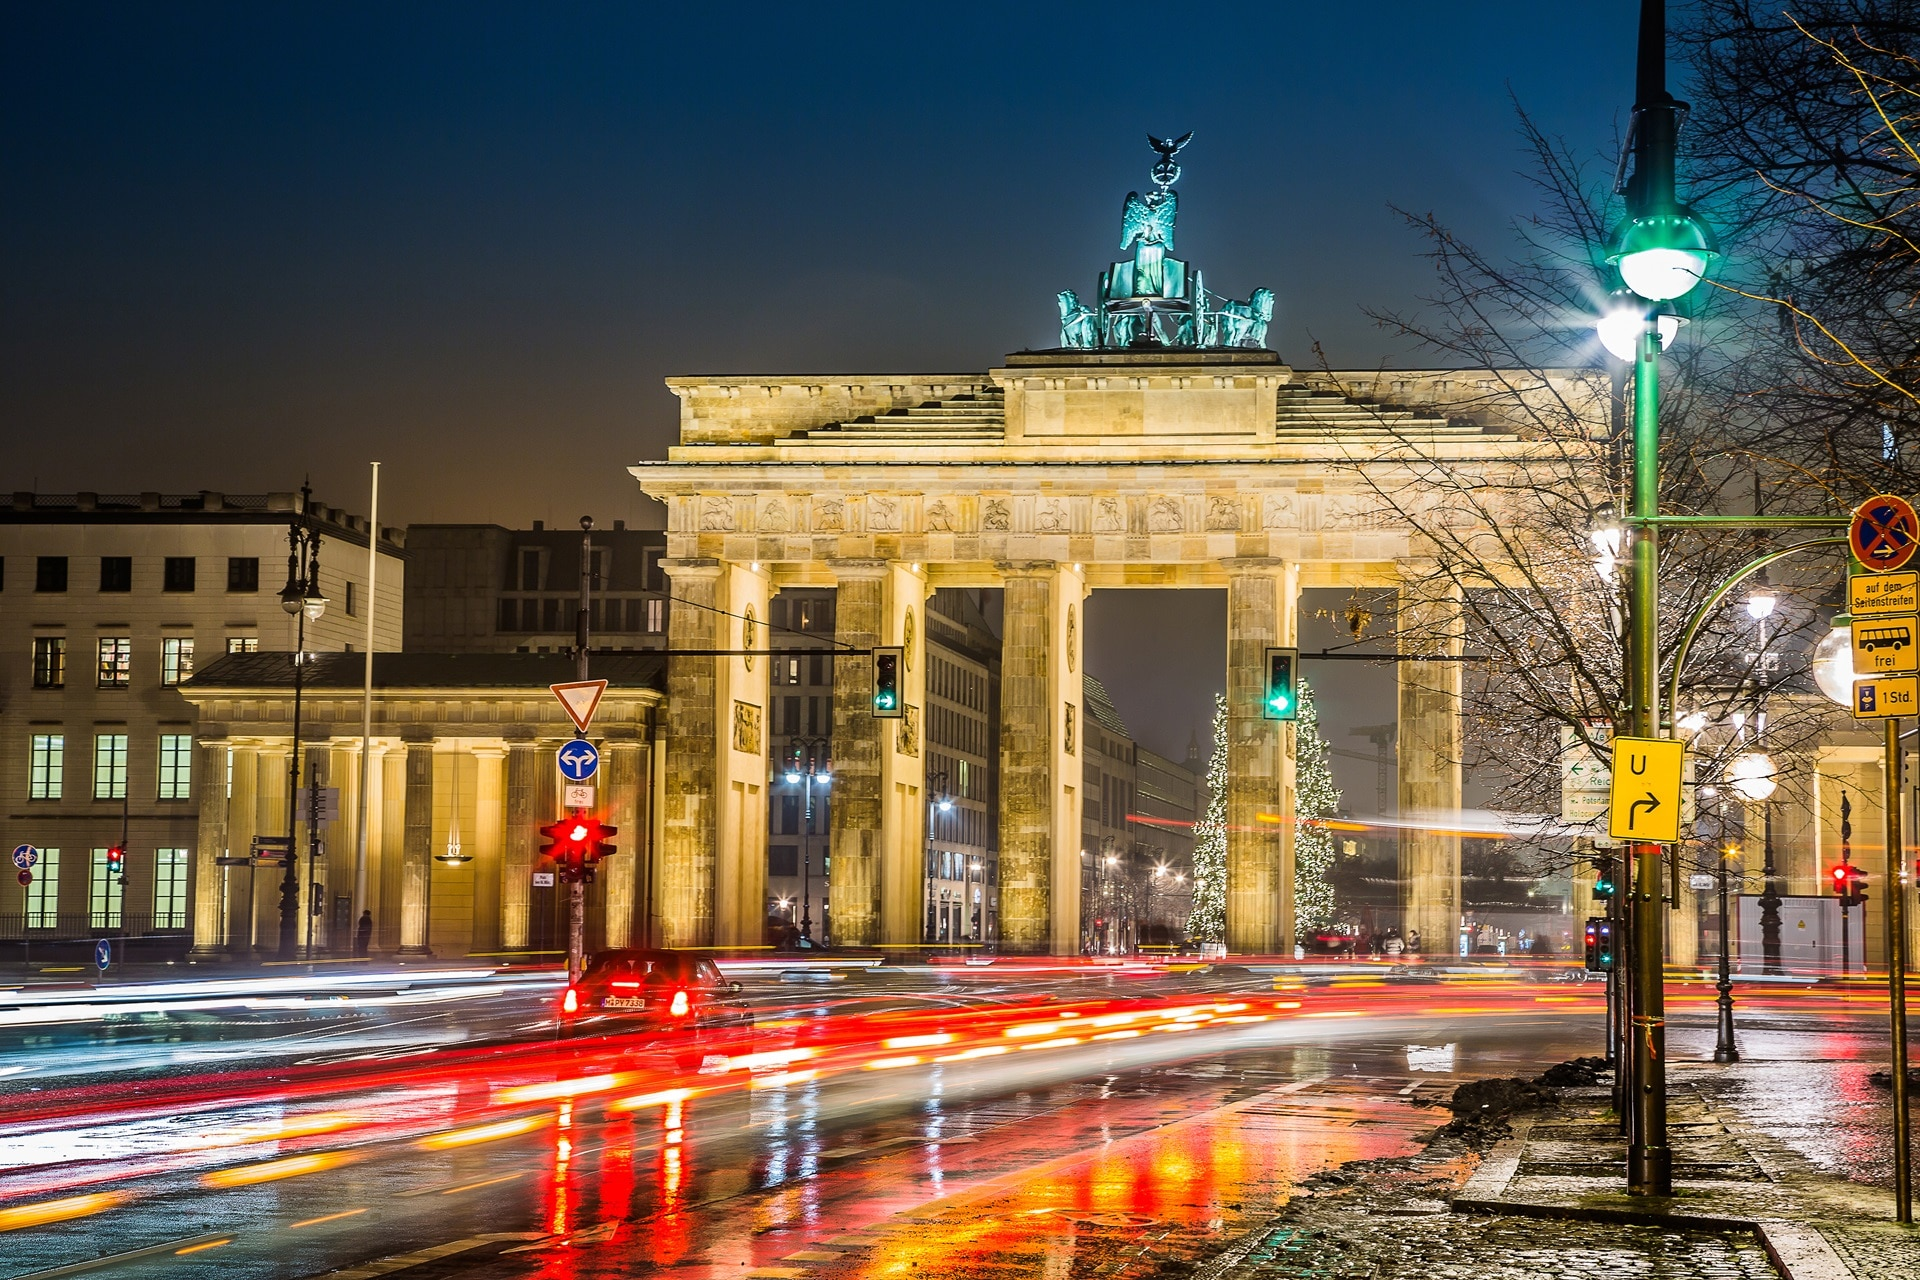 Reifenwechsel Berlin wann